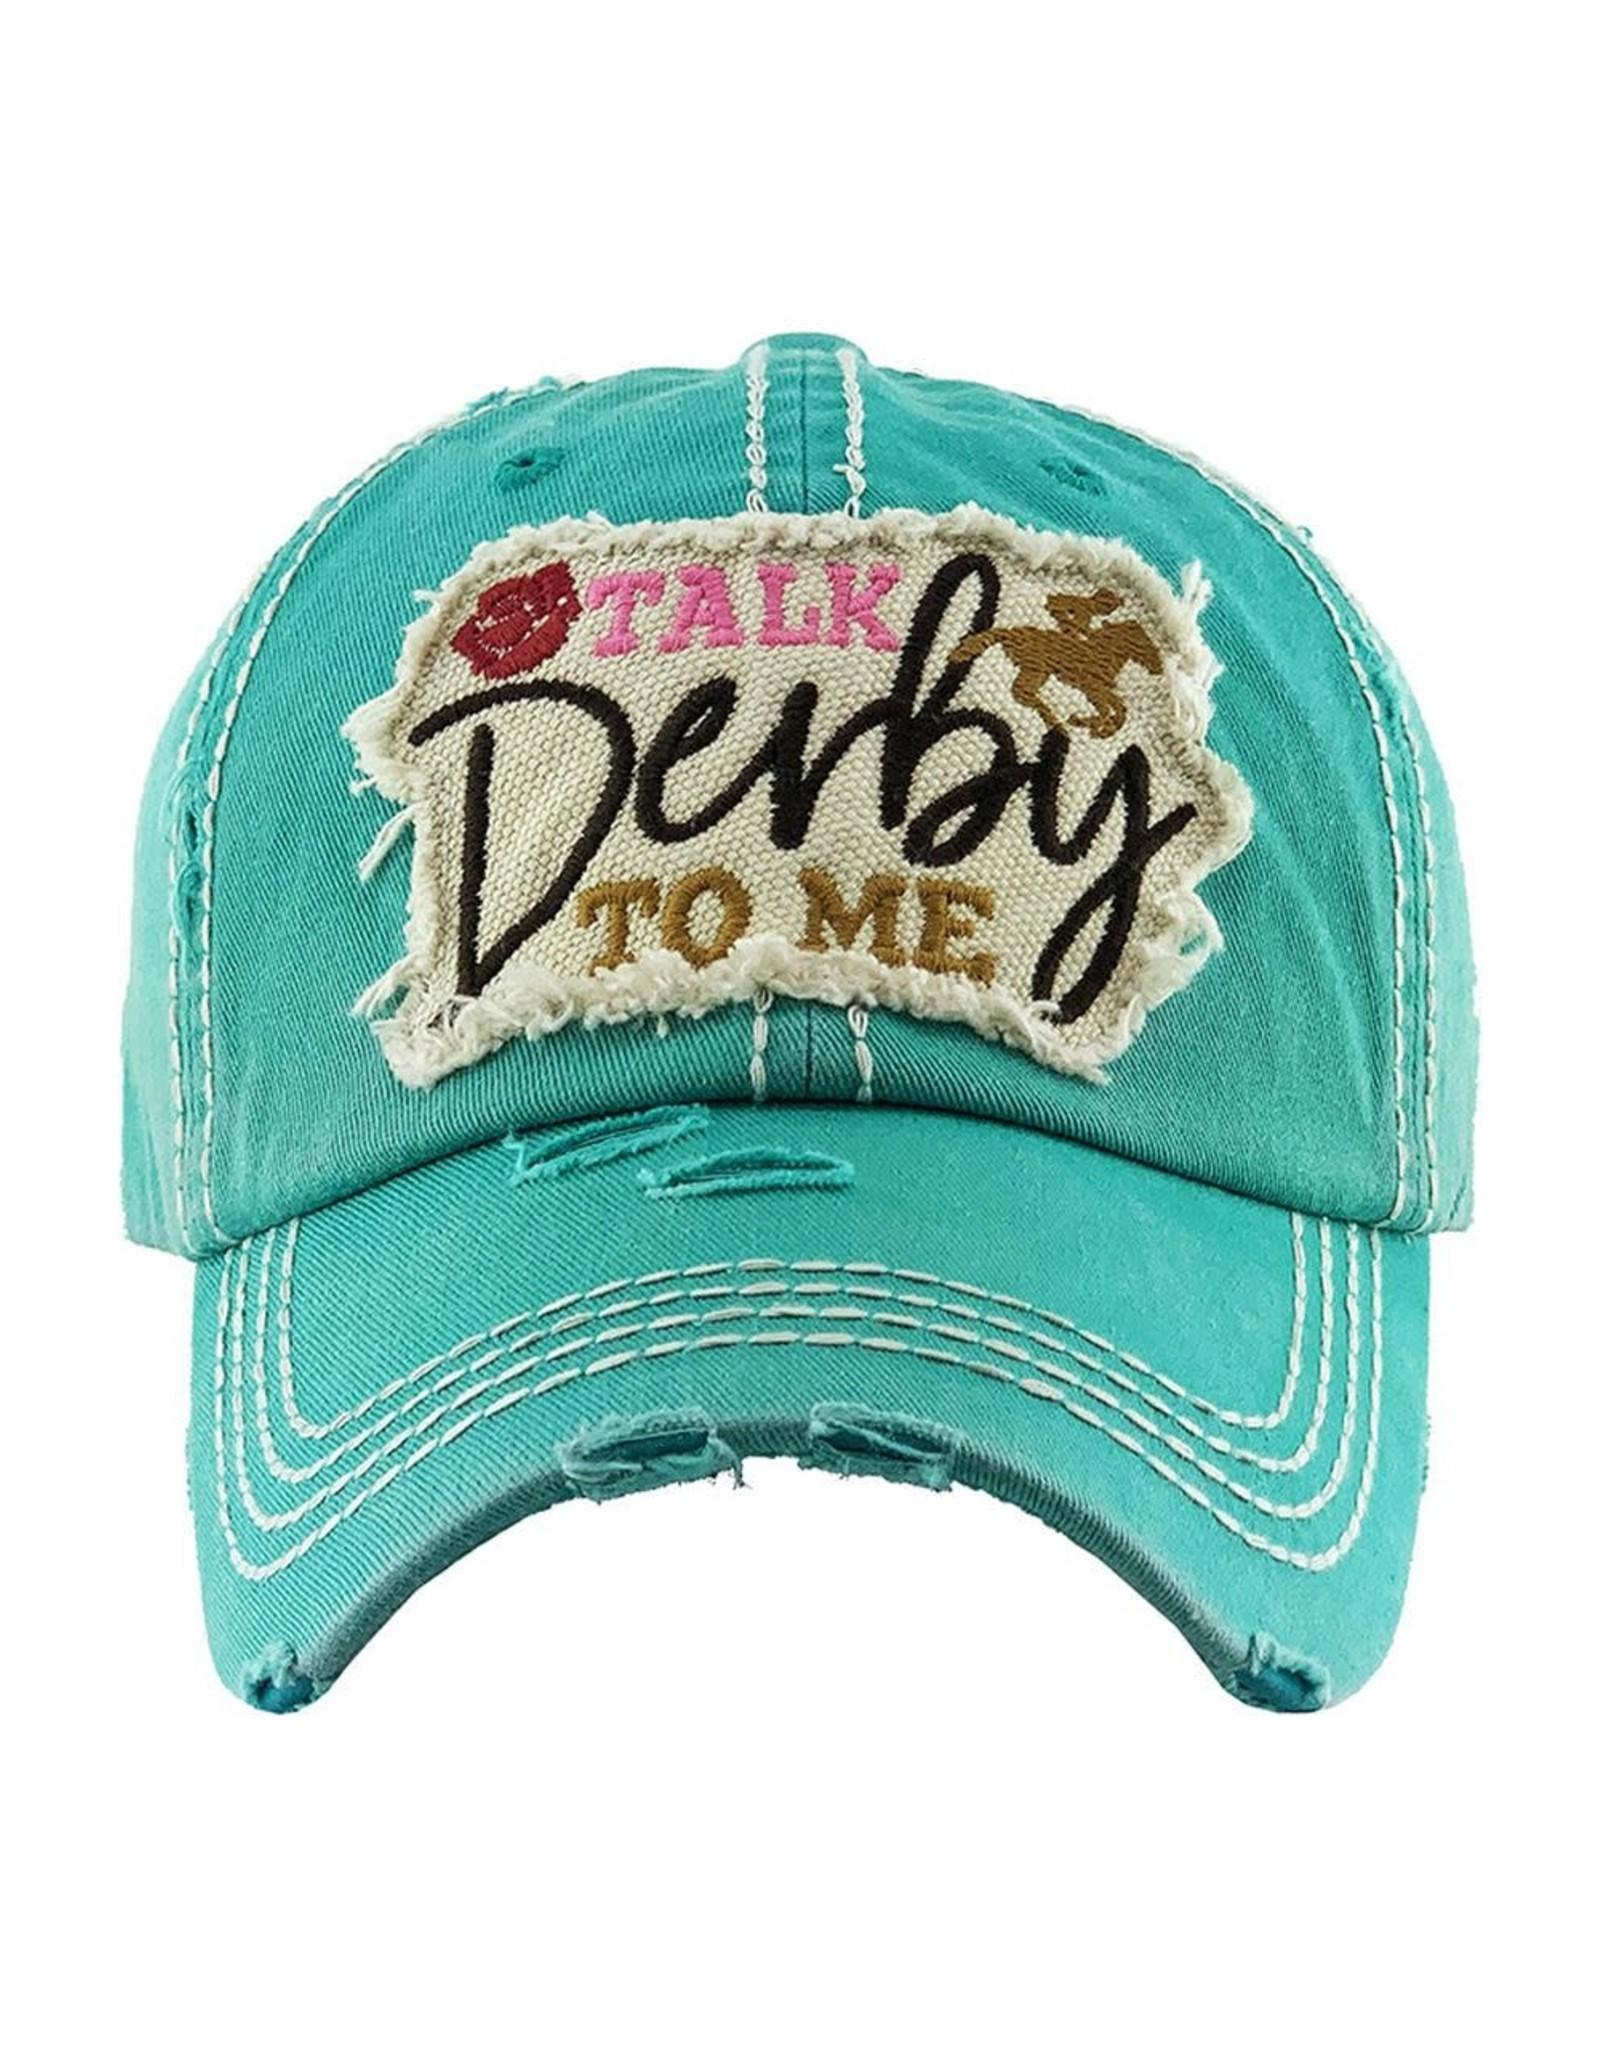 Talk Derby to me turq hat